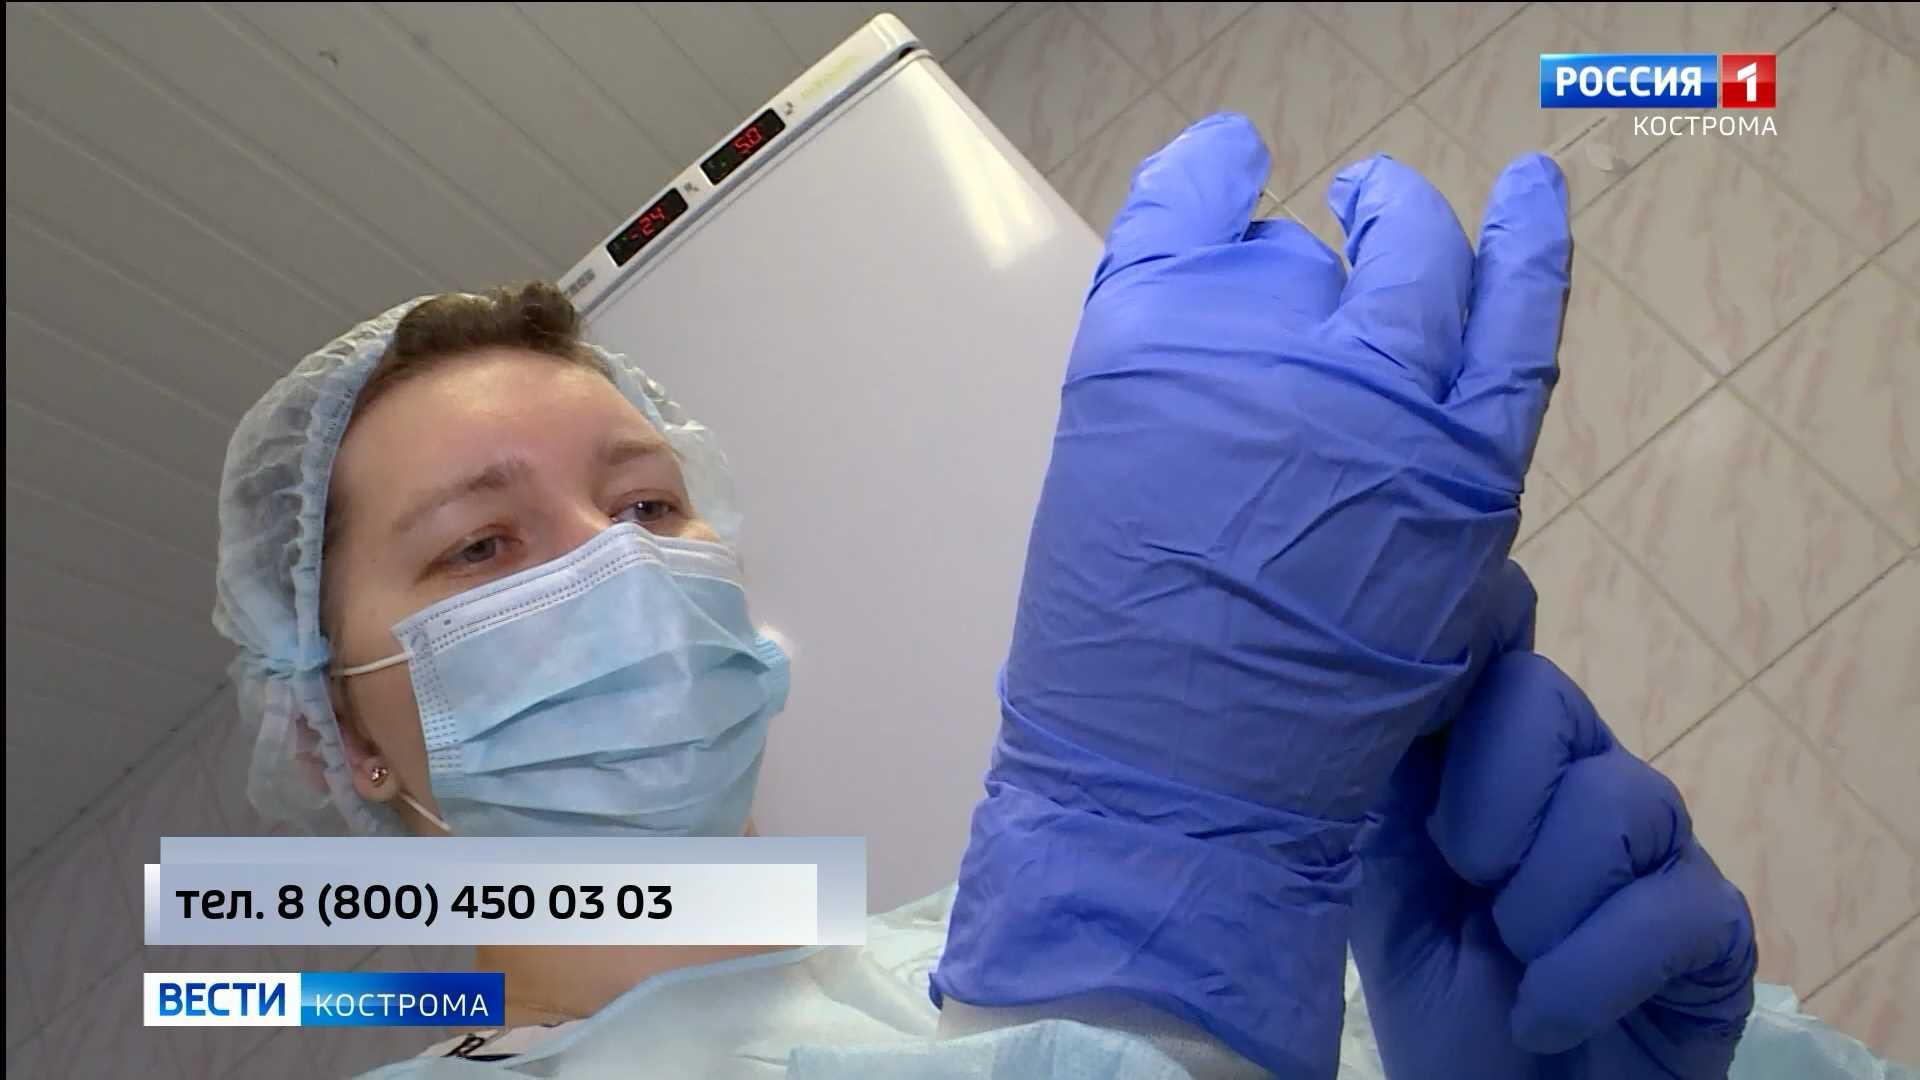 В Костроме началась вакцинация от коронавируса всех желающих